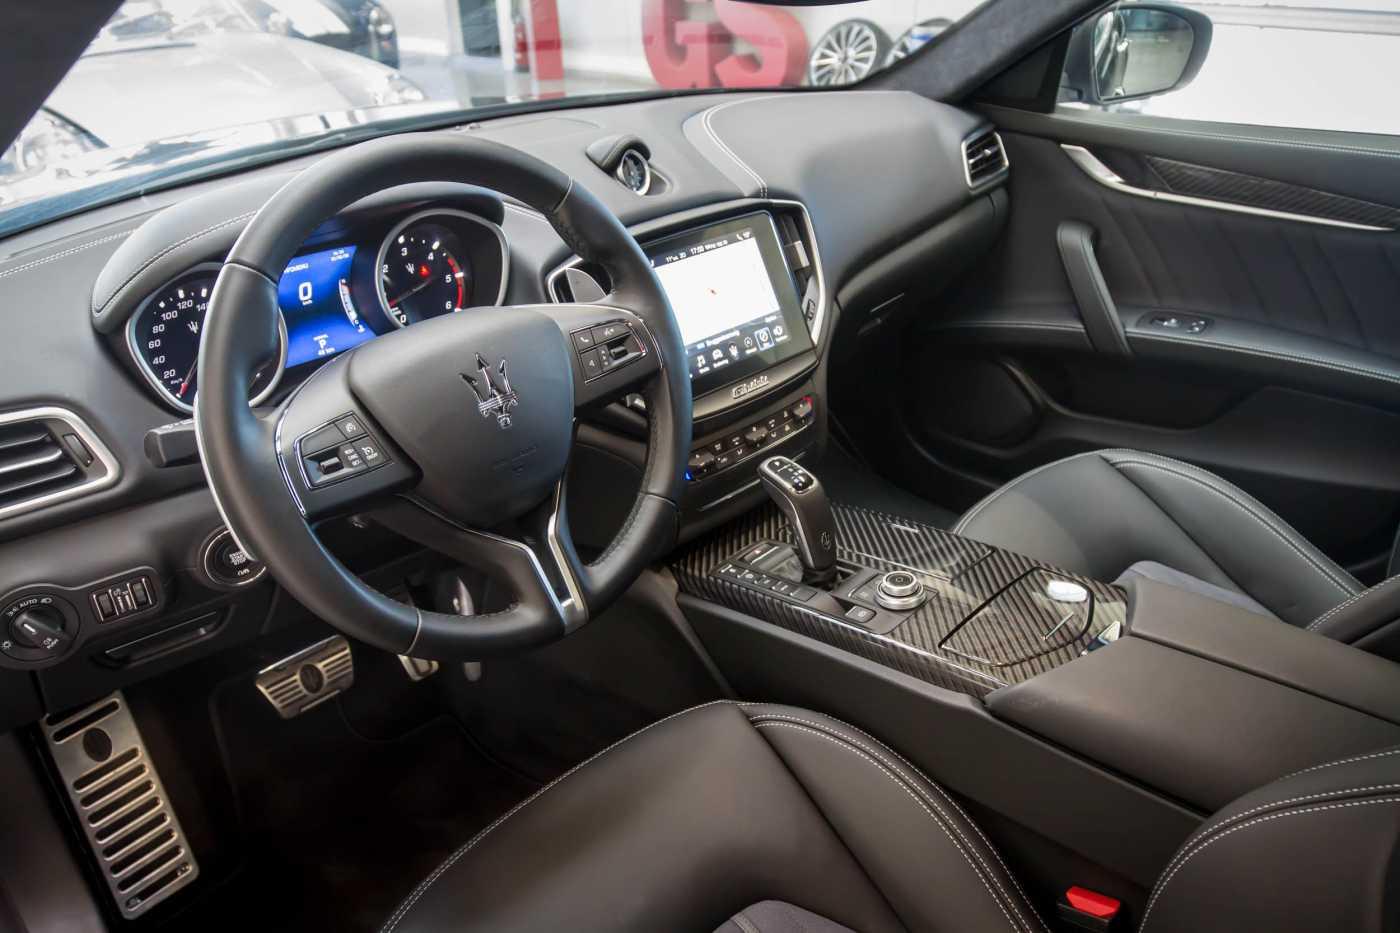 Maserati Ghibli Diesel GranLusso Keyless Sports Exhaust LED Camera 3/29